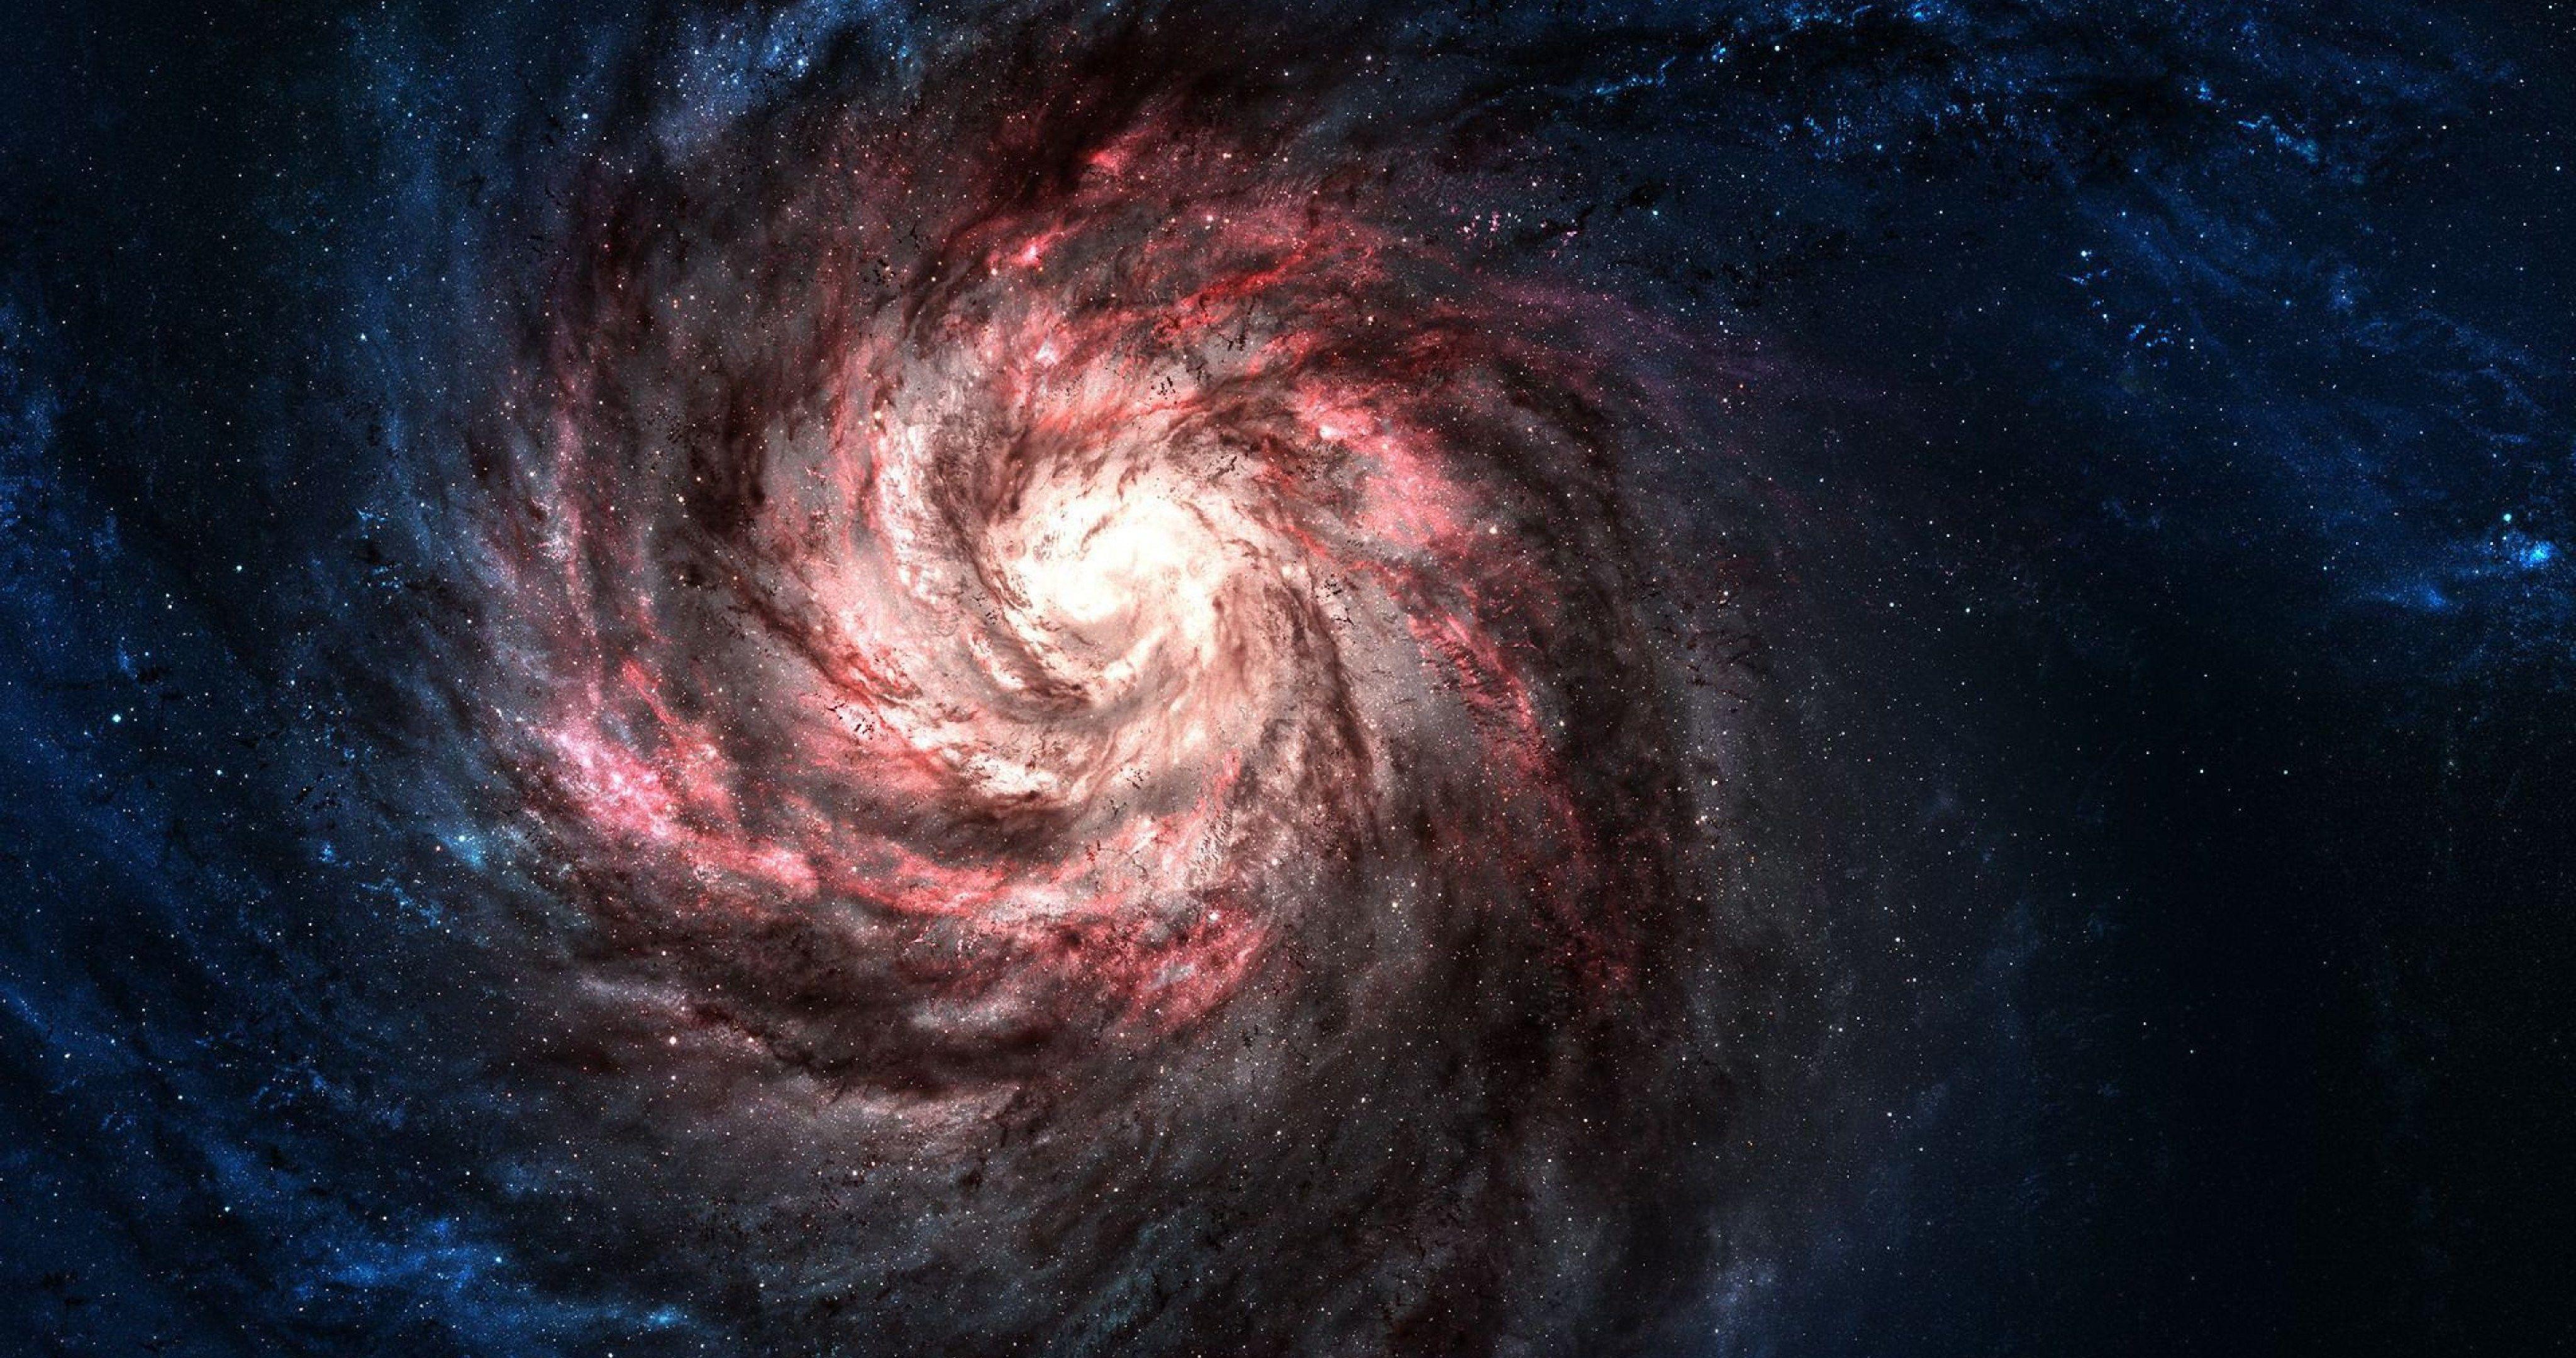 Galaxy Vortex Space 4k Ultra Hd Wallpaper Galaxy Wallpaper Wallpaper Space Nebula